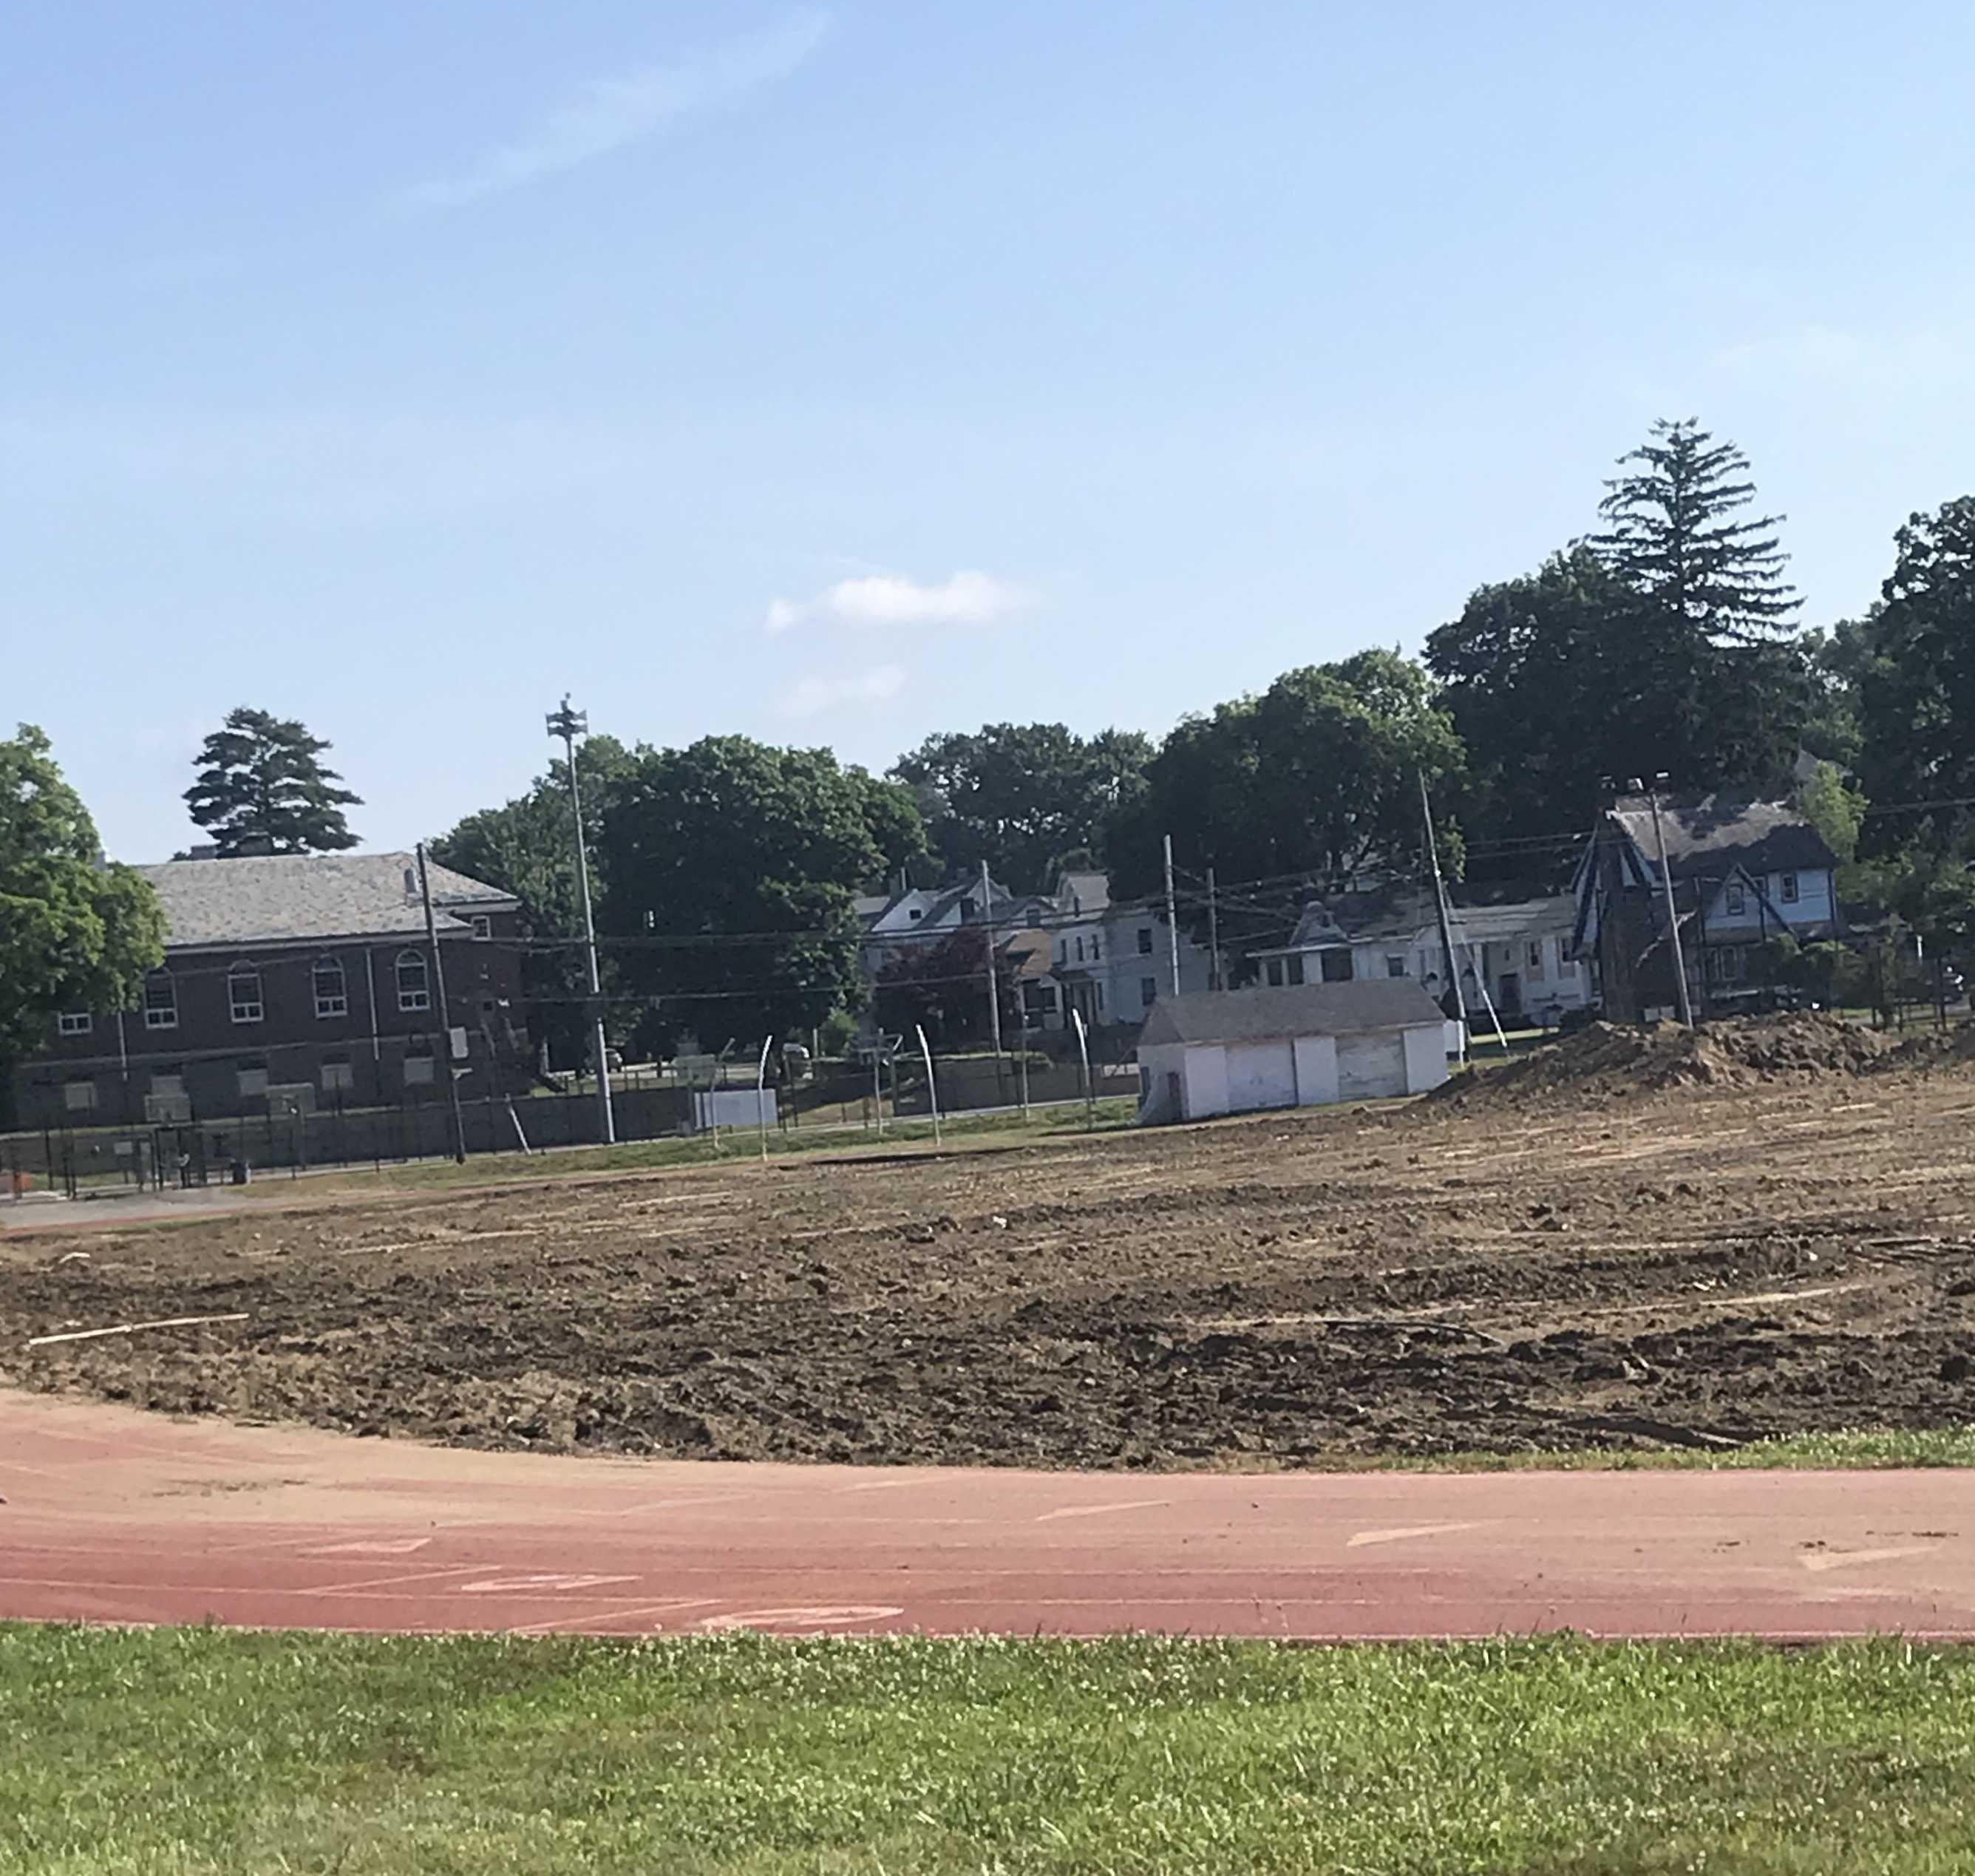 Field torn up